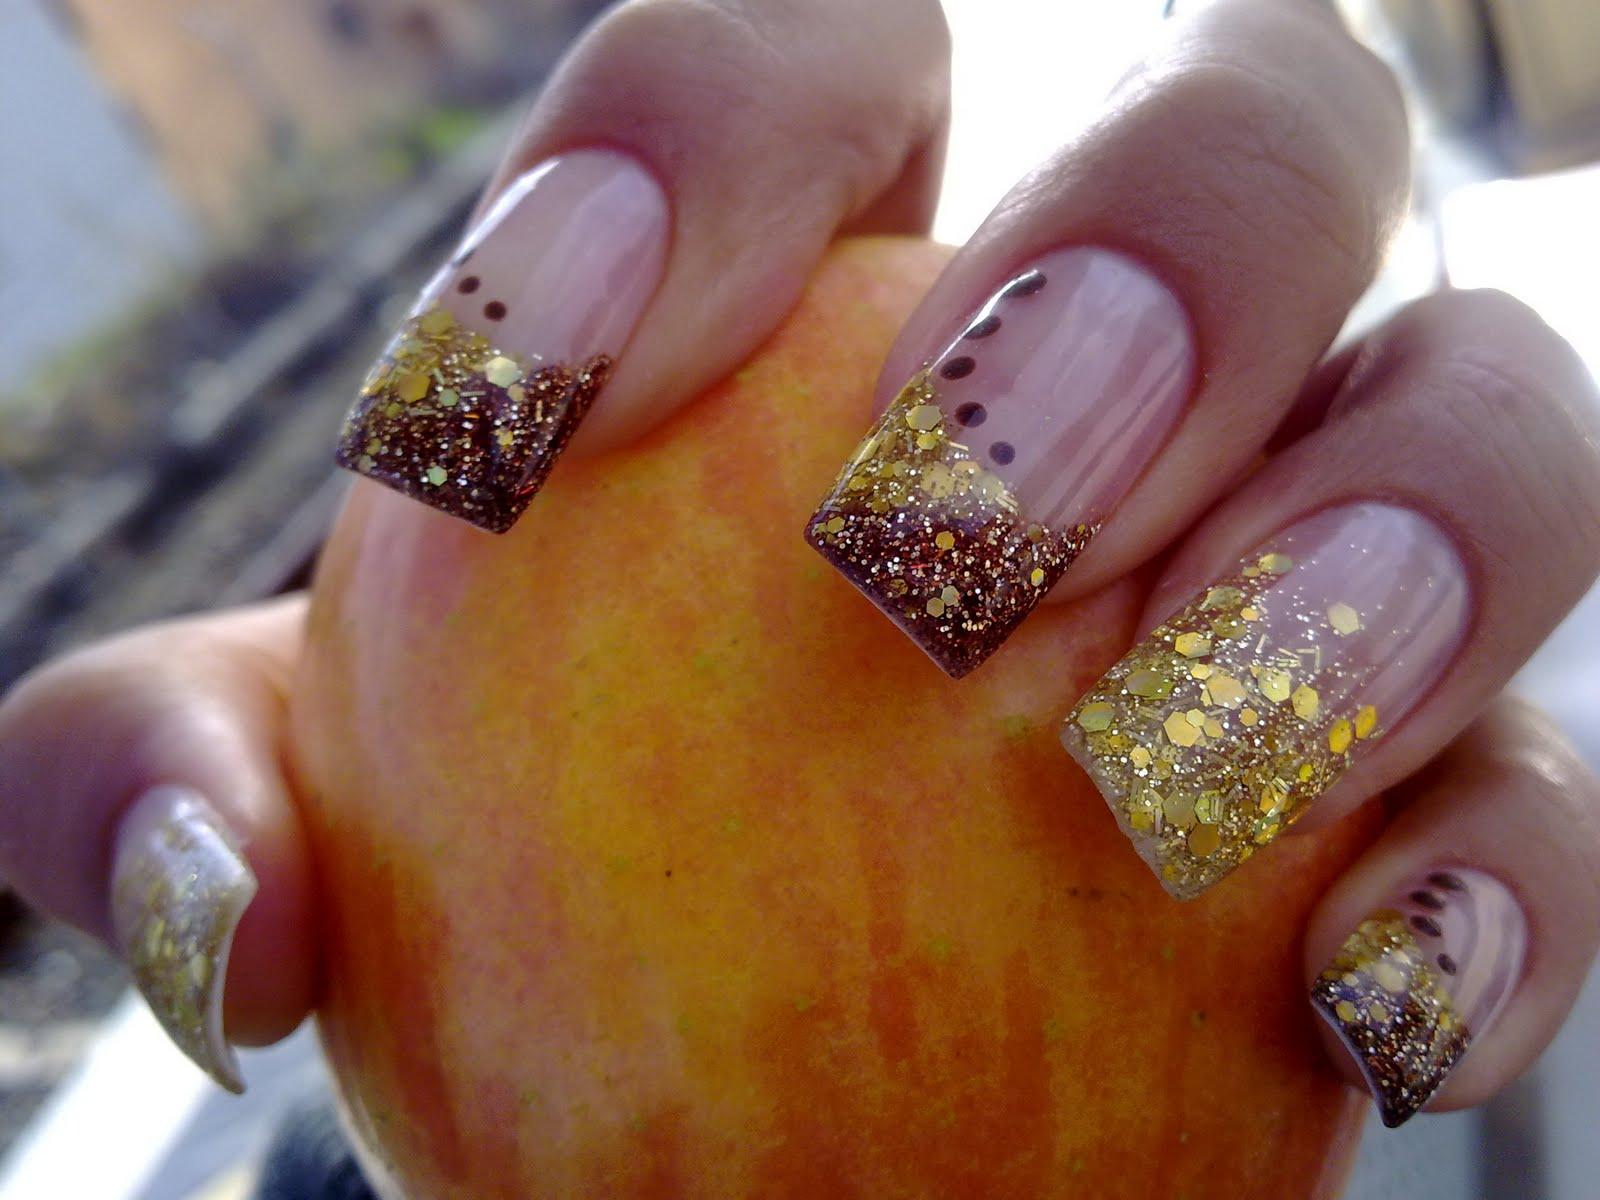 como quitar las uñas acrilicas o esculpidas en casa